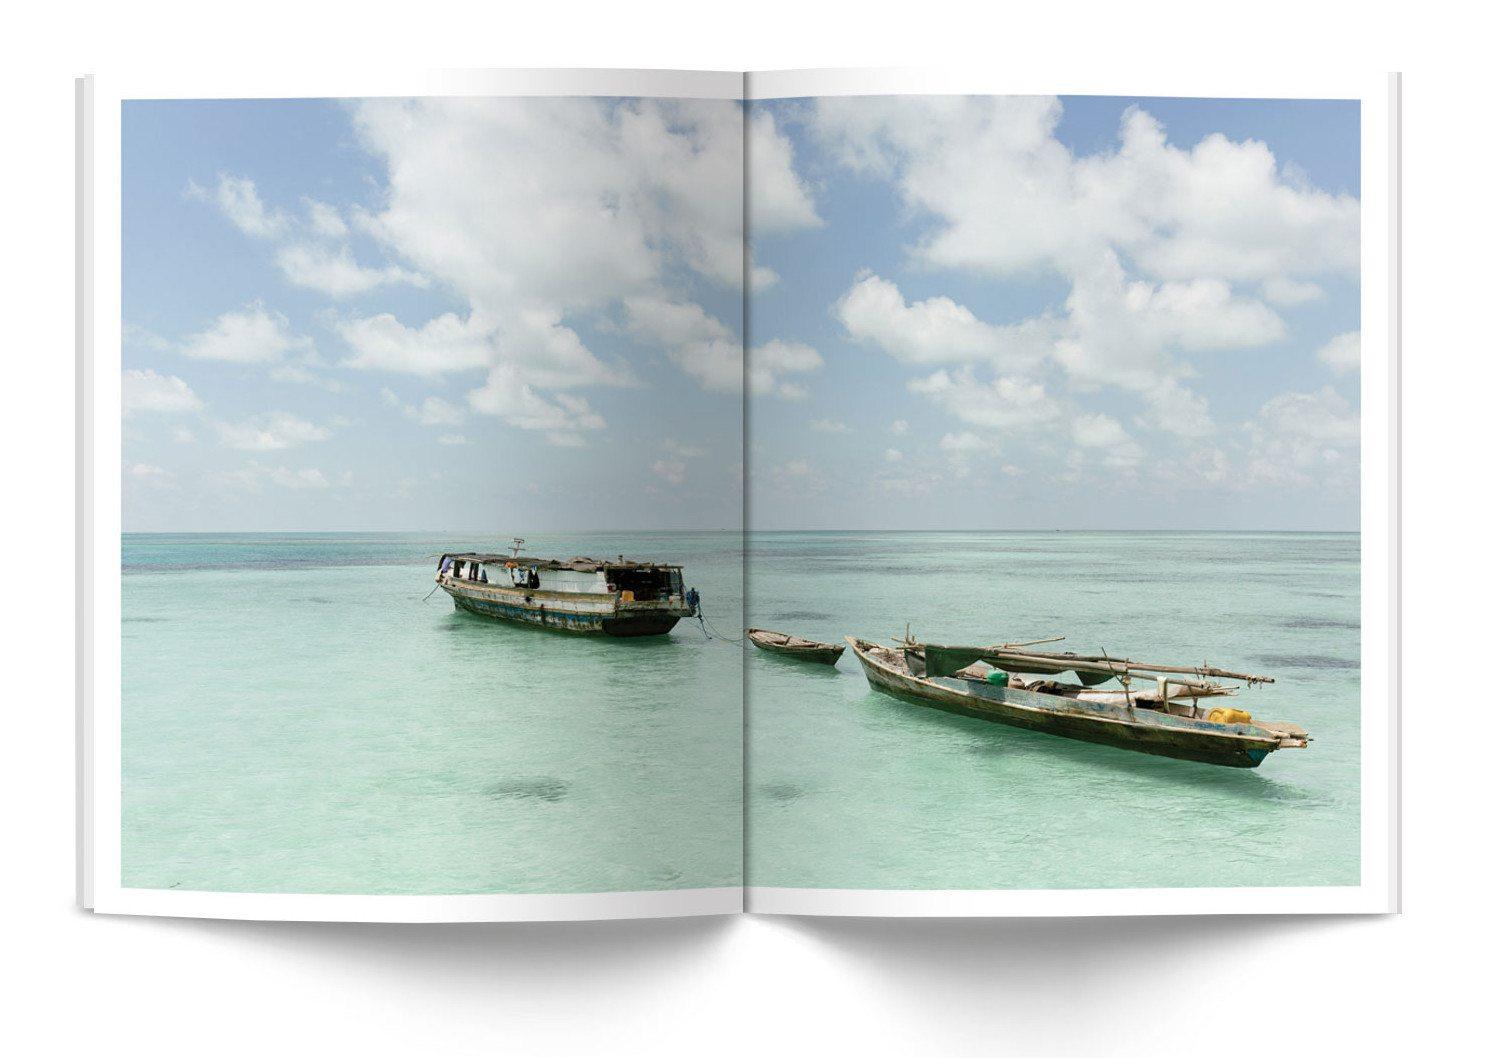 HAYO_sea gypsies